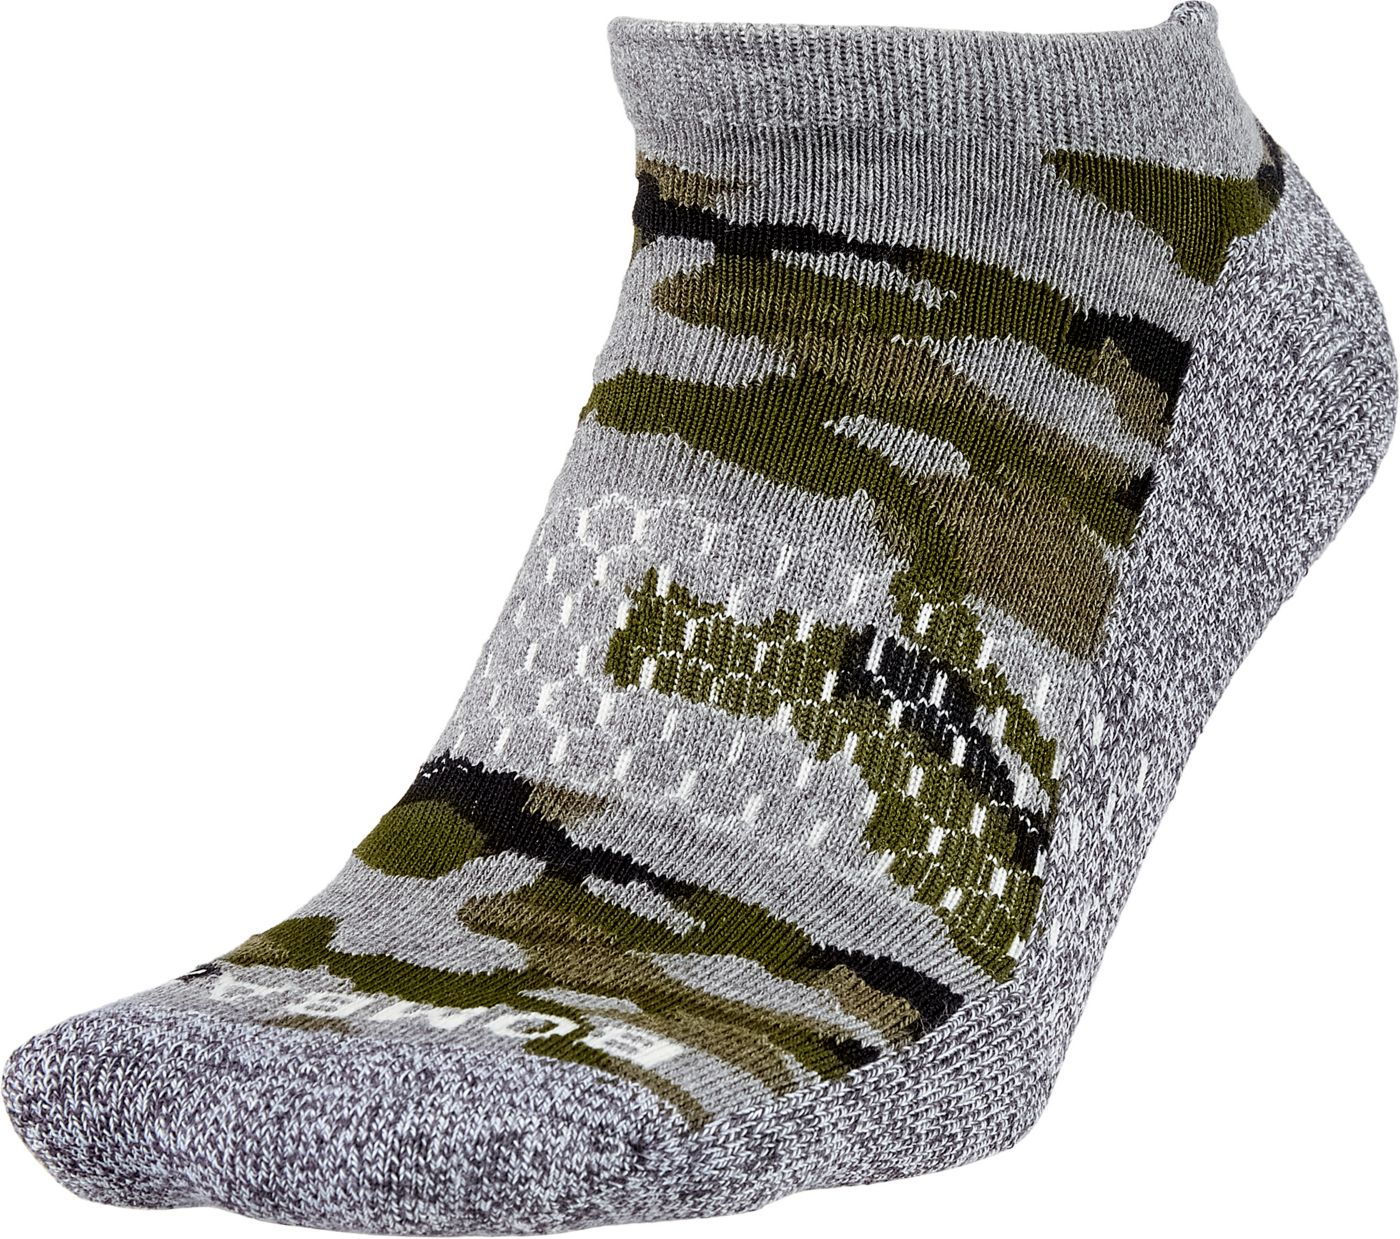 Bombas Men's Camo Ankle Socks